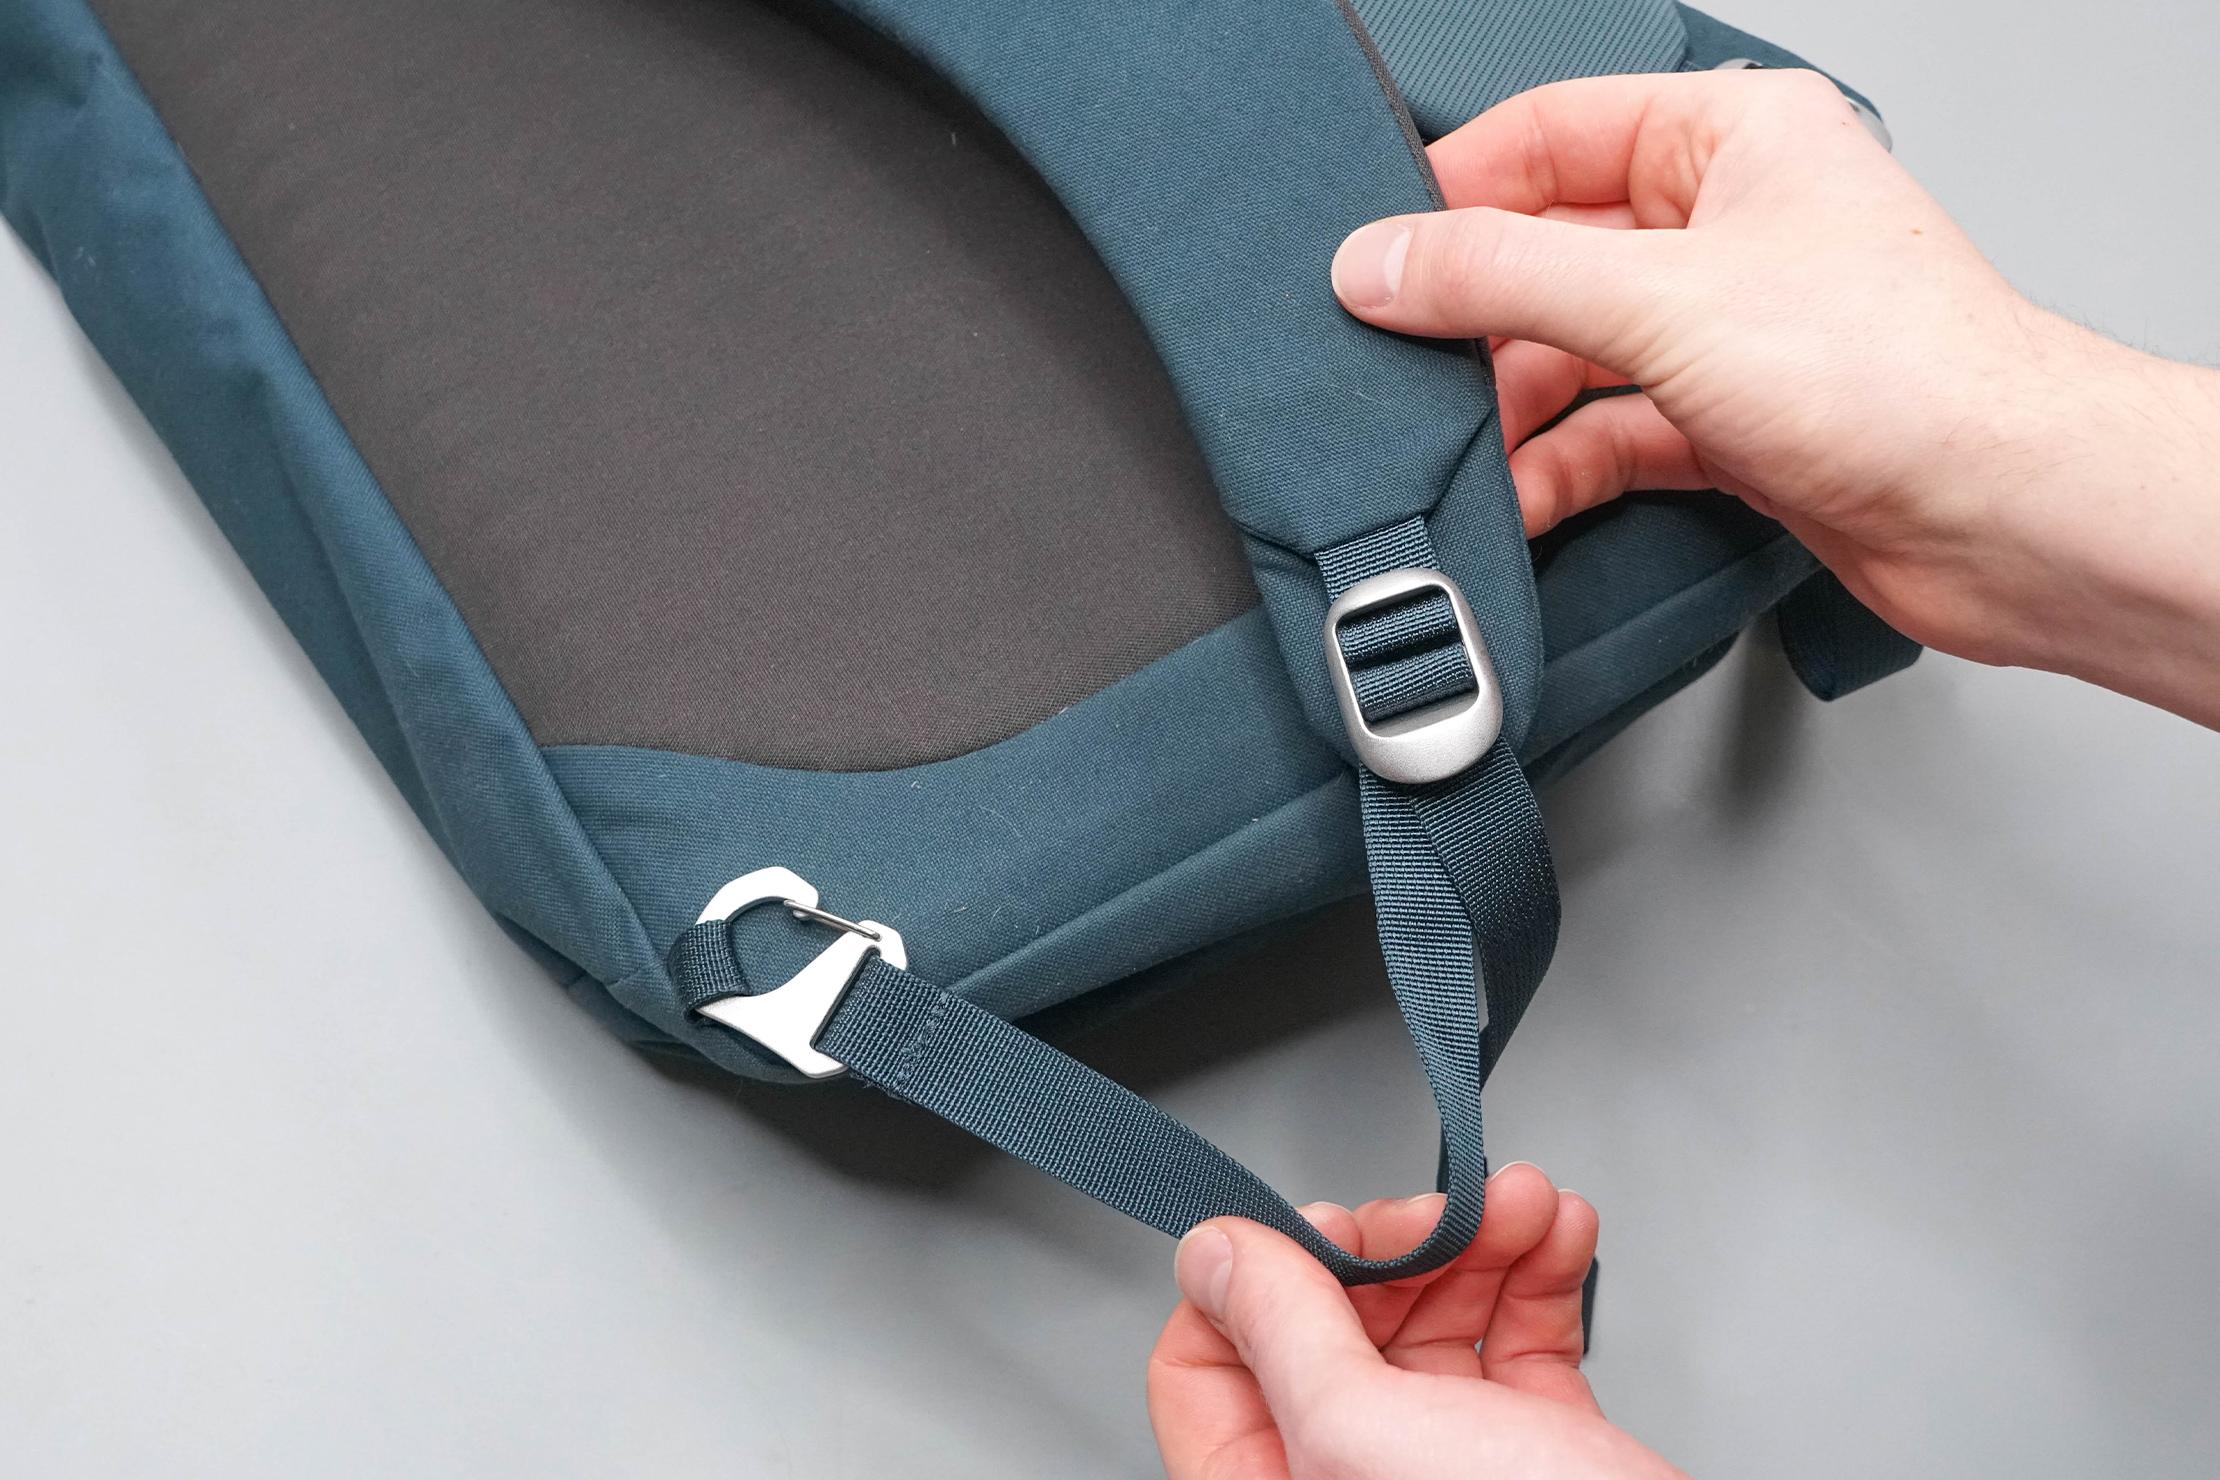 Osprey Arcane Tote Pack Shoulder Strap Attachment